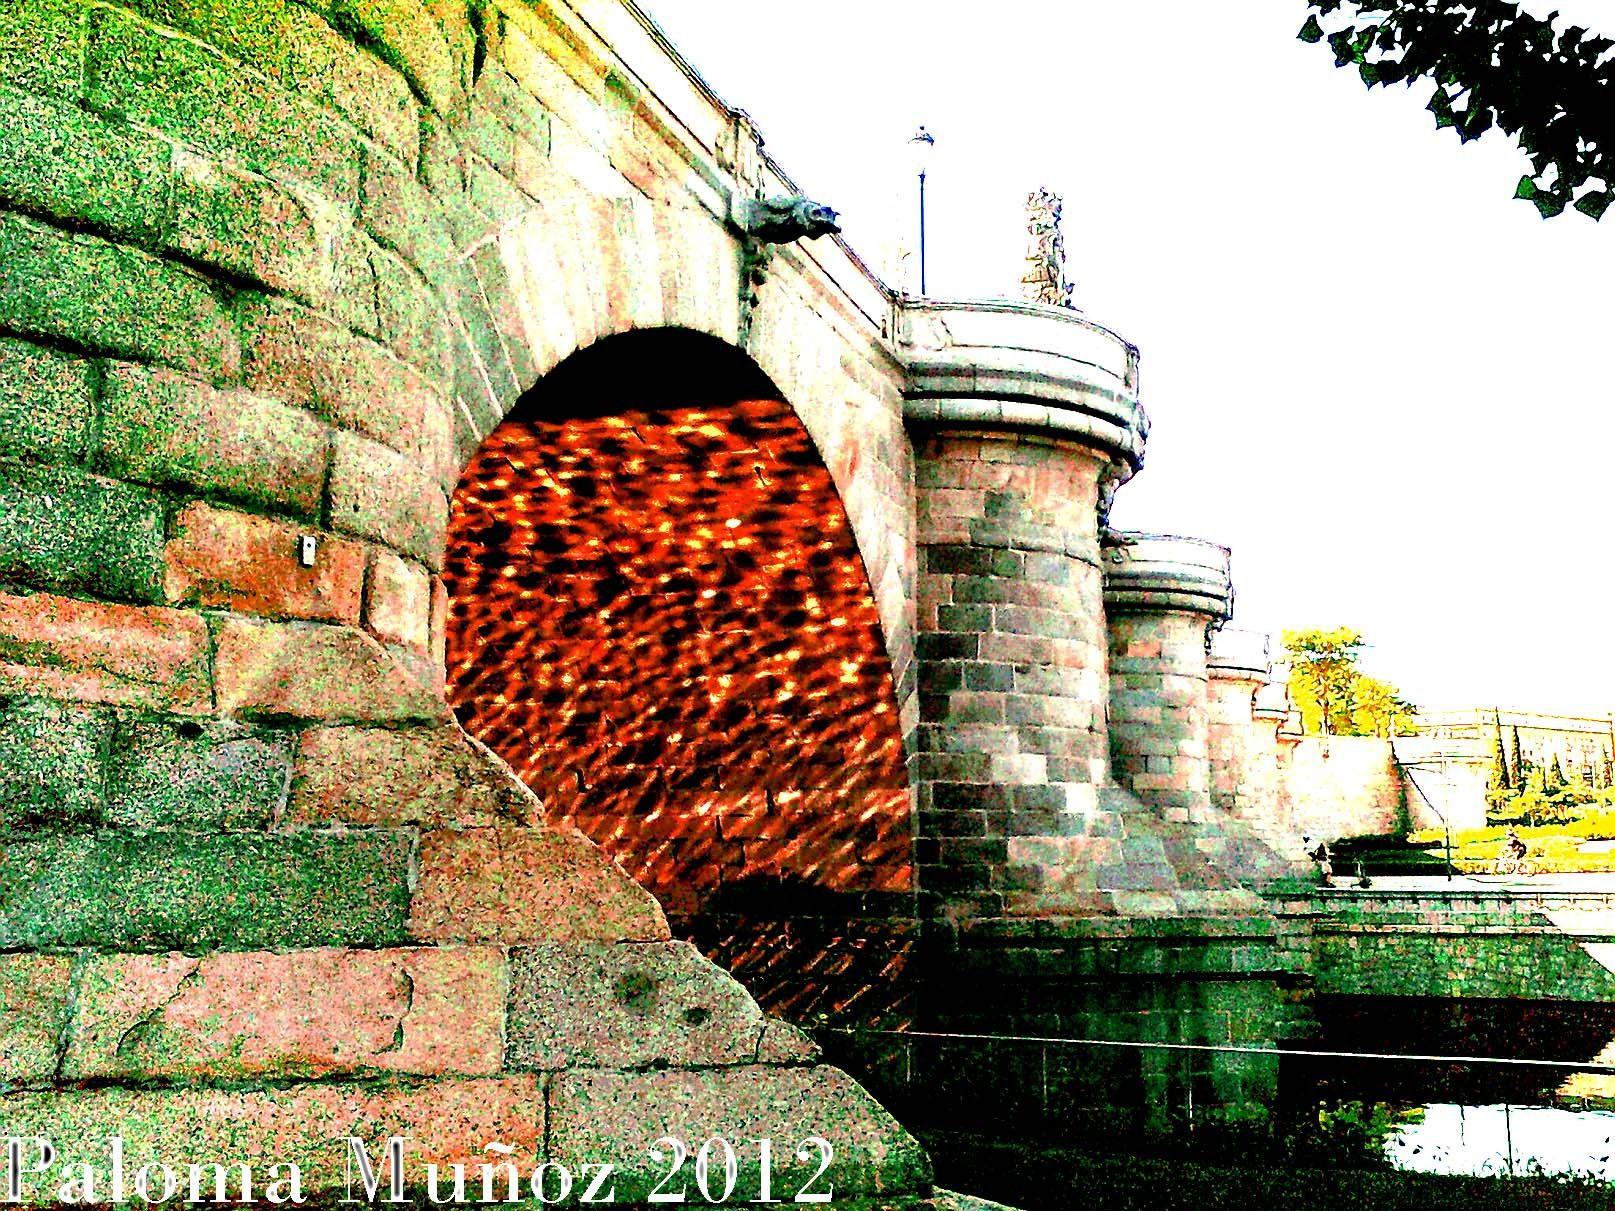 Puente de Toledo. Toledo Bridge